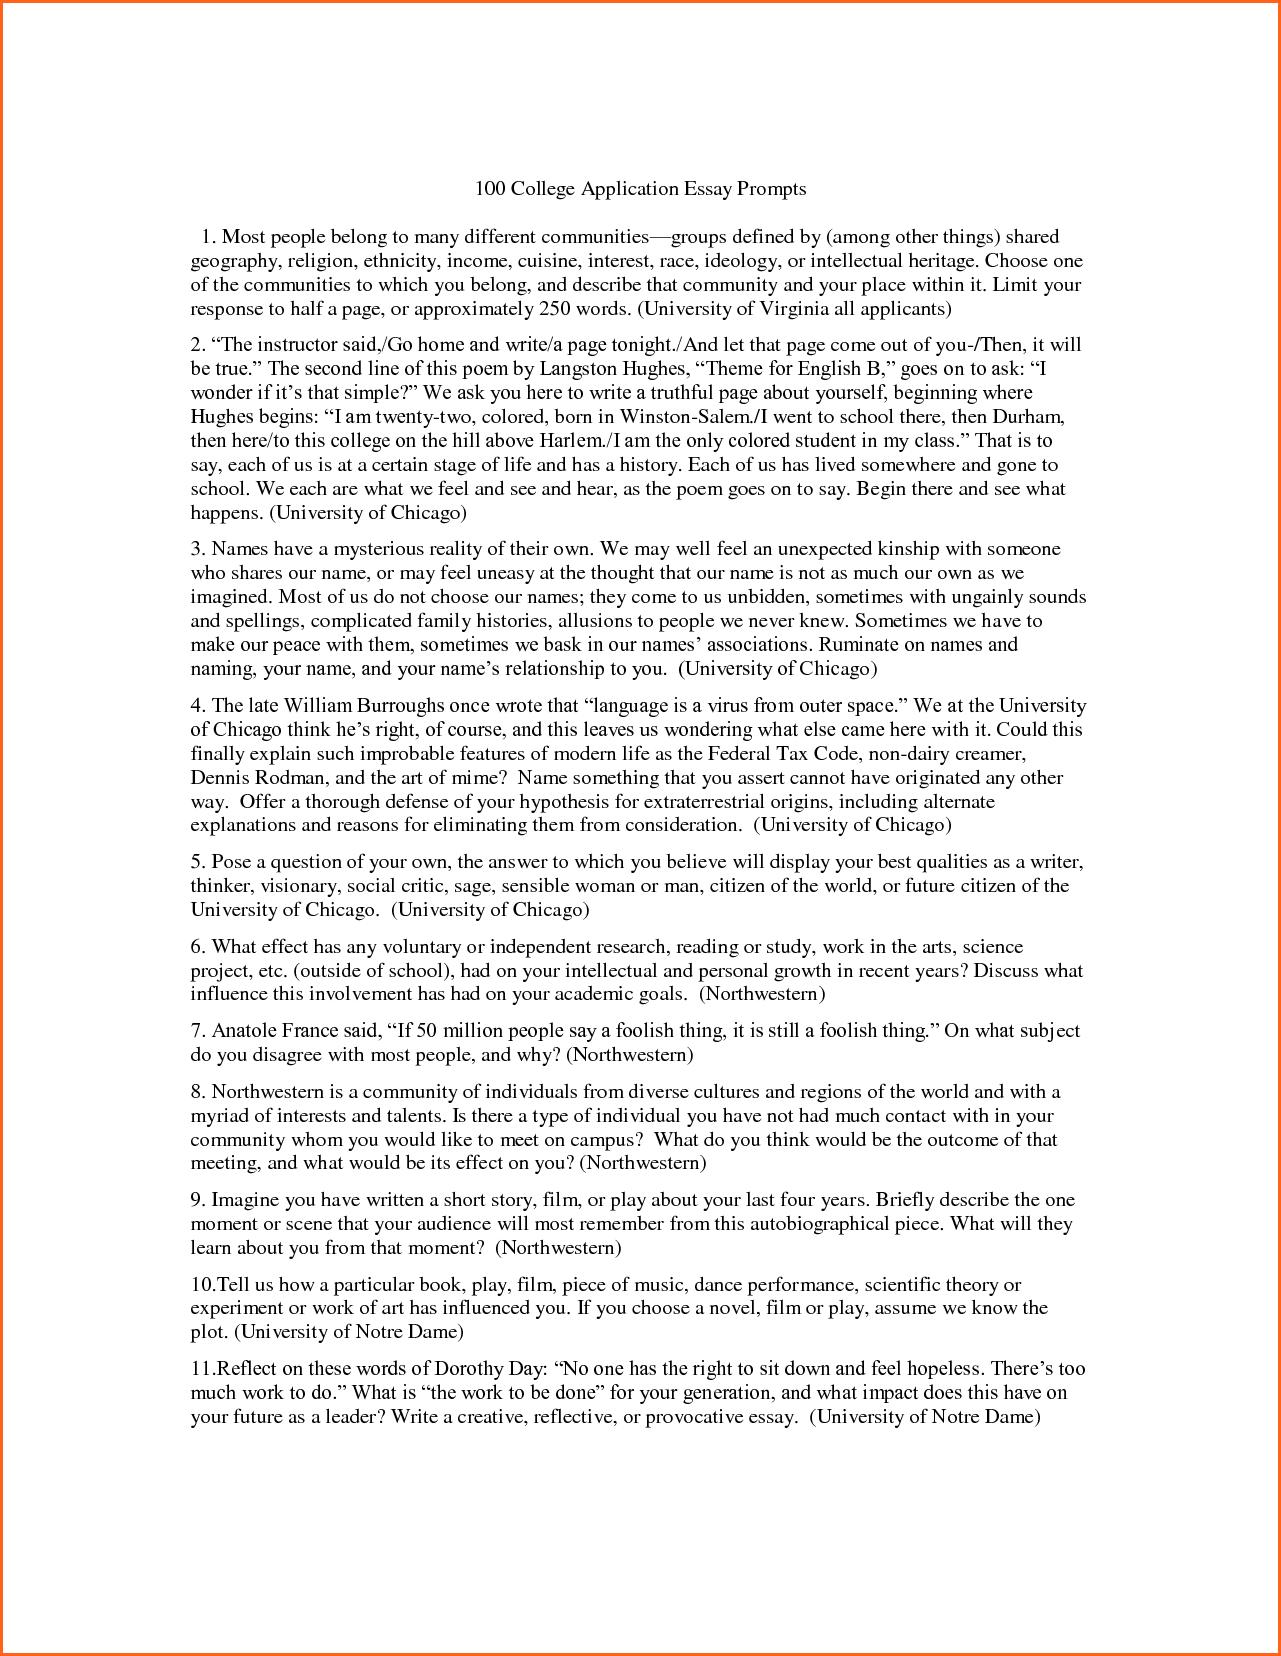 Sparknotes narrative essay